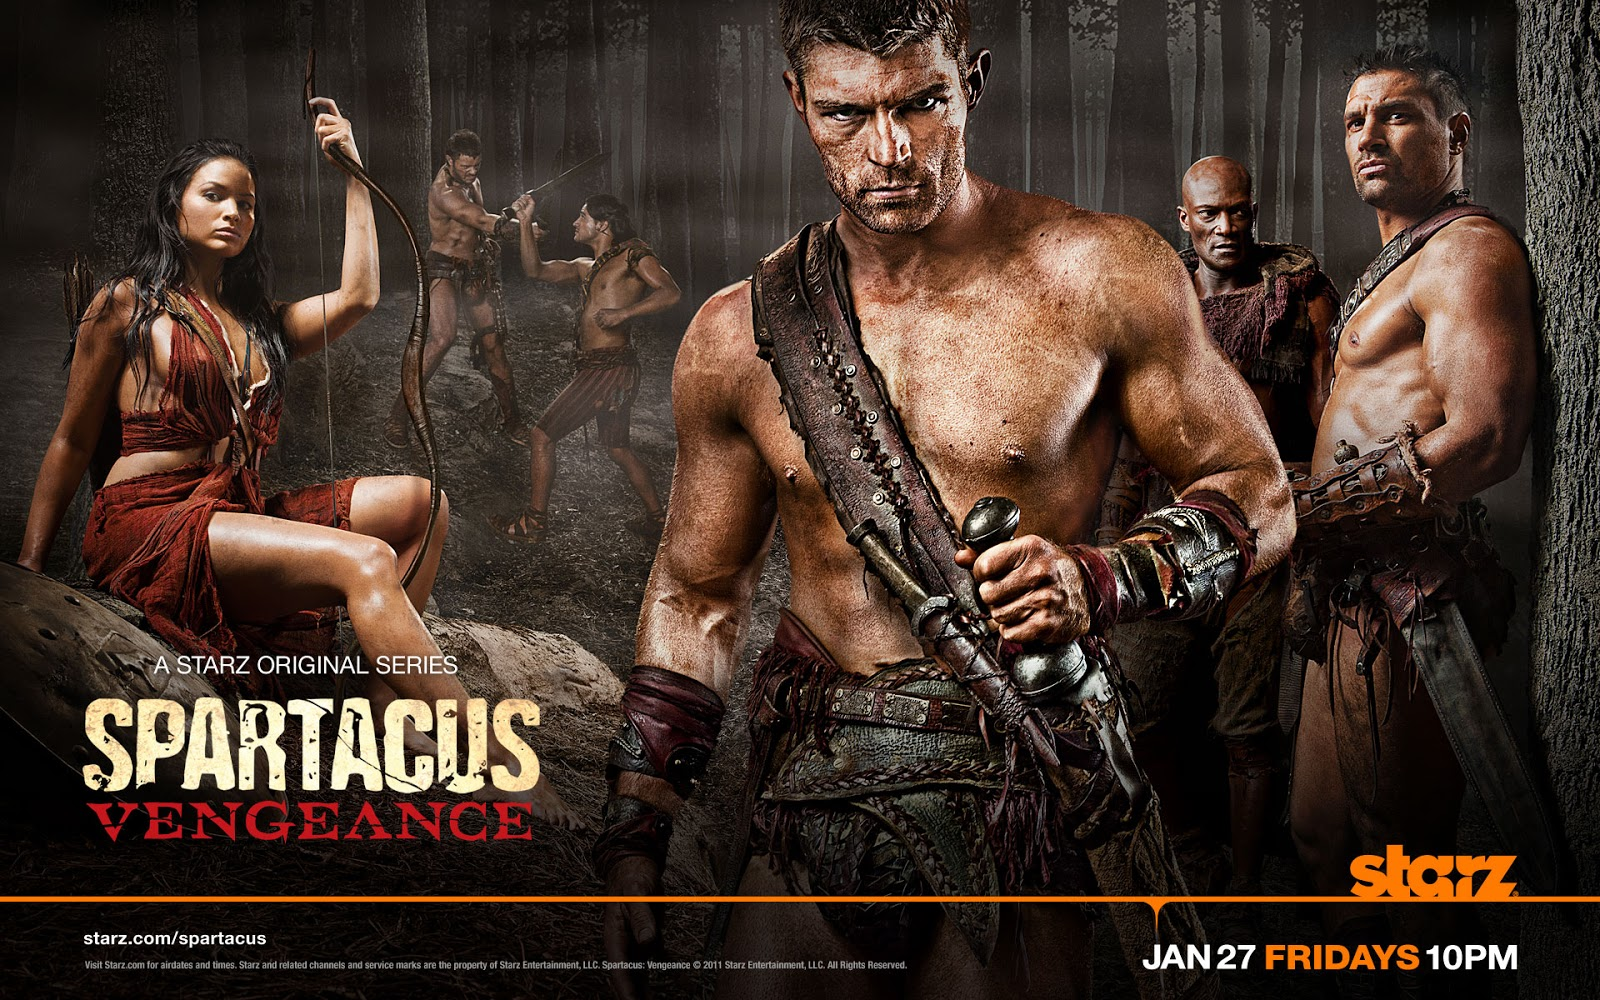 http://1.bp.blogspot.com/-47NZvqWqTKo/UWnGXOzGaEI/AAAAAAAAAFk/SrbWsBNaJnM/s1600/spartacus-vengeance-2012-spartacus-season-2-sezonul-2-wallpaper-3.jpg